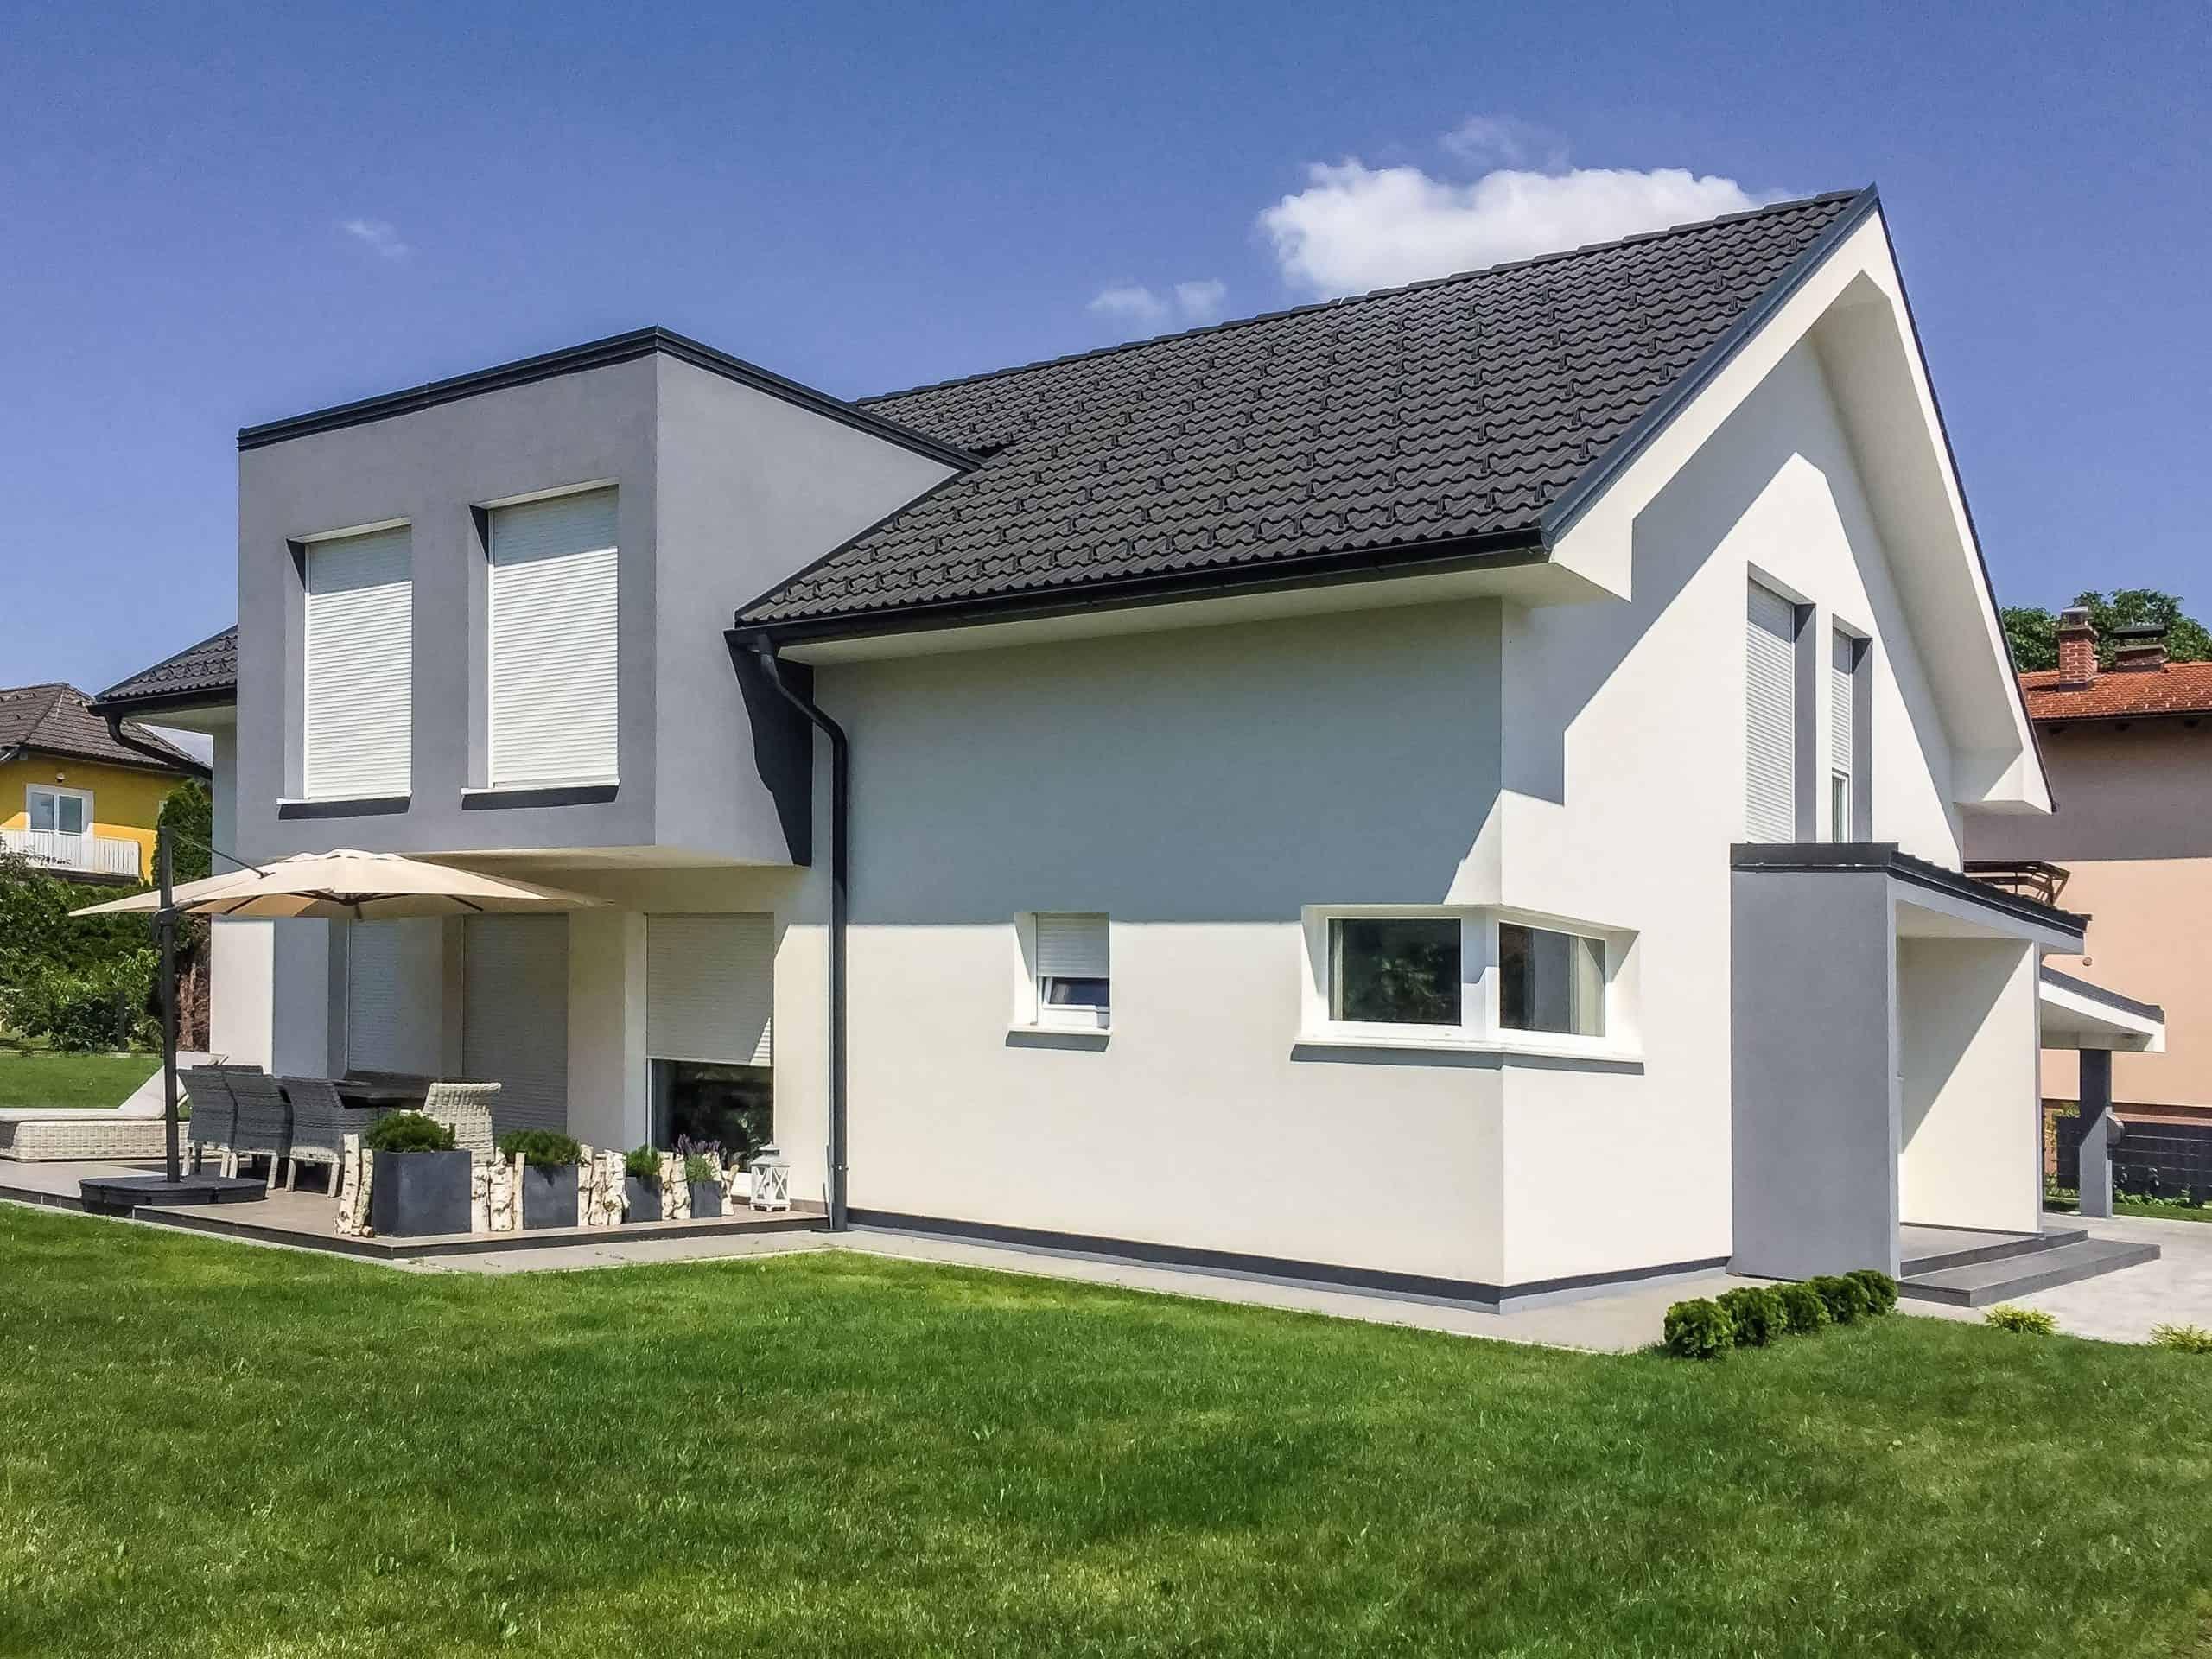 Fertighaus Mansardenhaus Flex 126